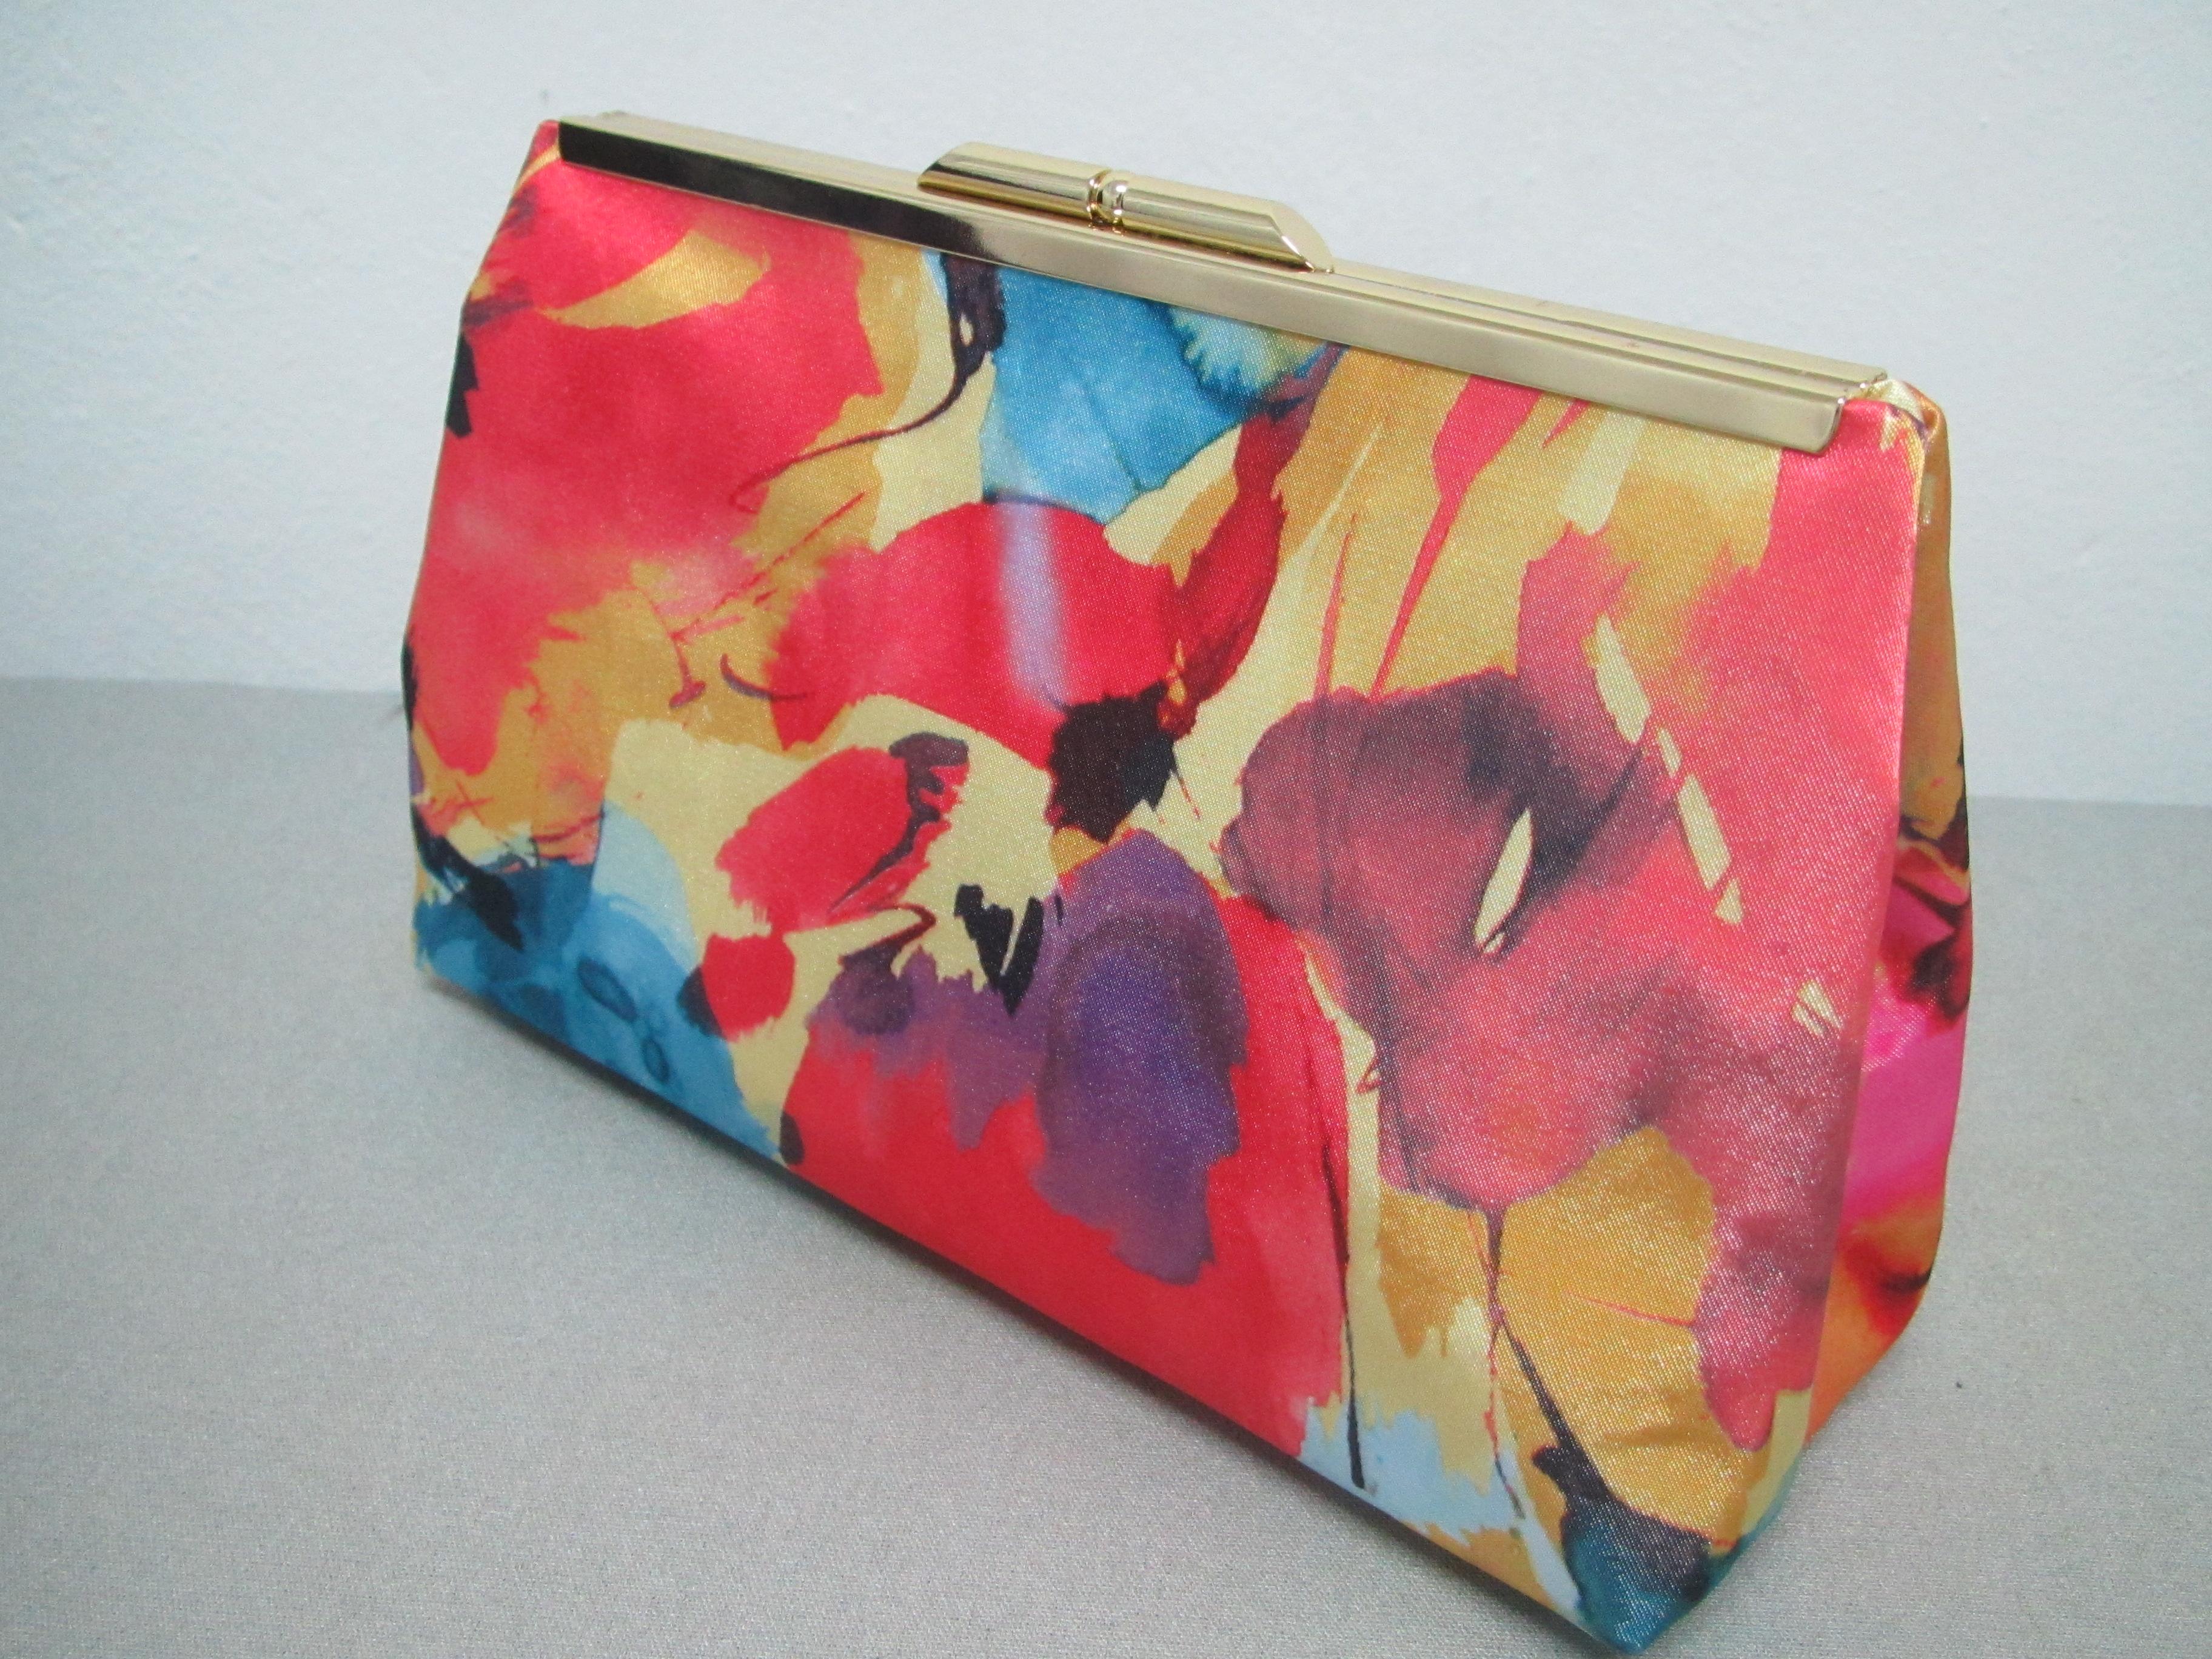 04c84bf1c Bolsa Clutch Estampada Abstrato Colorido no Elo7 | Eleganza Design (7D5A9C)